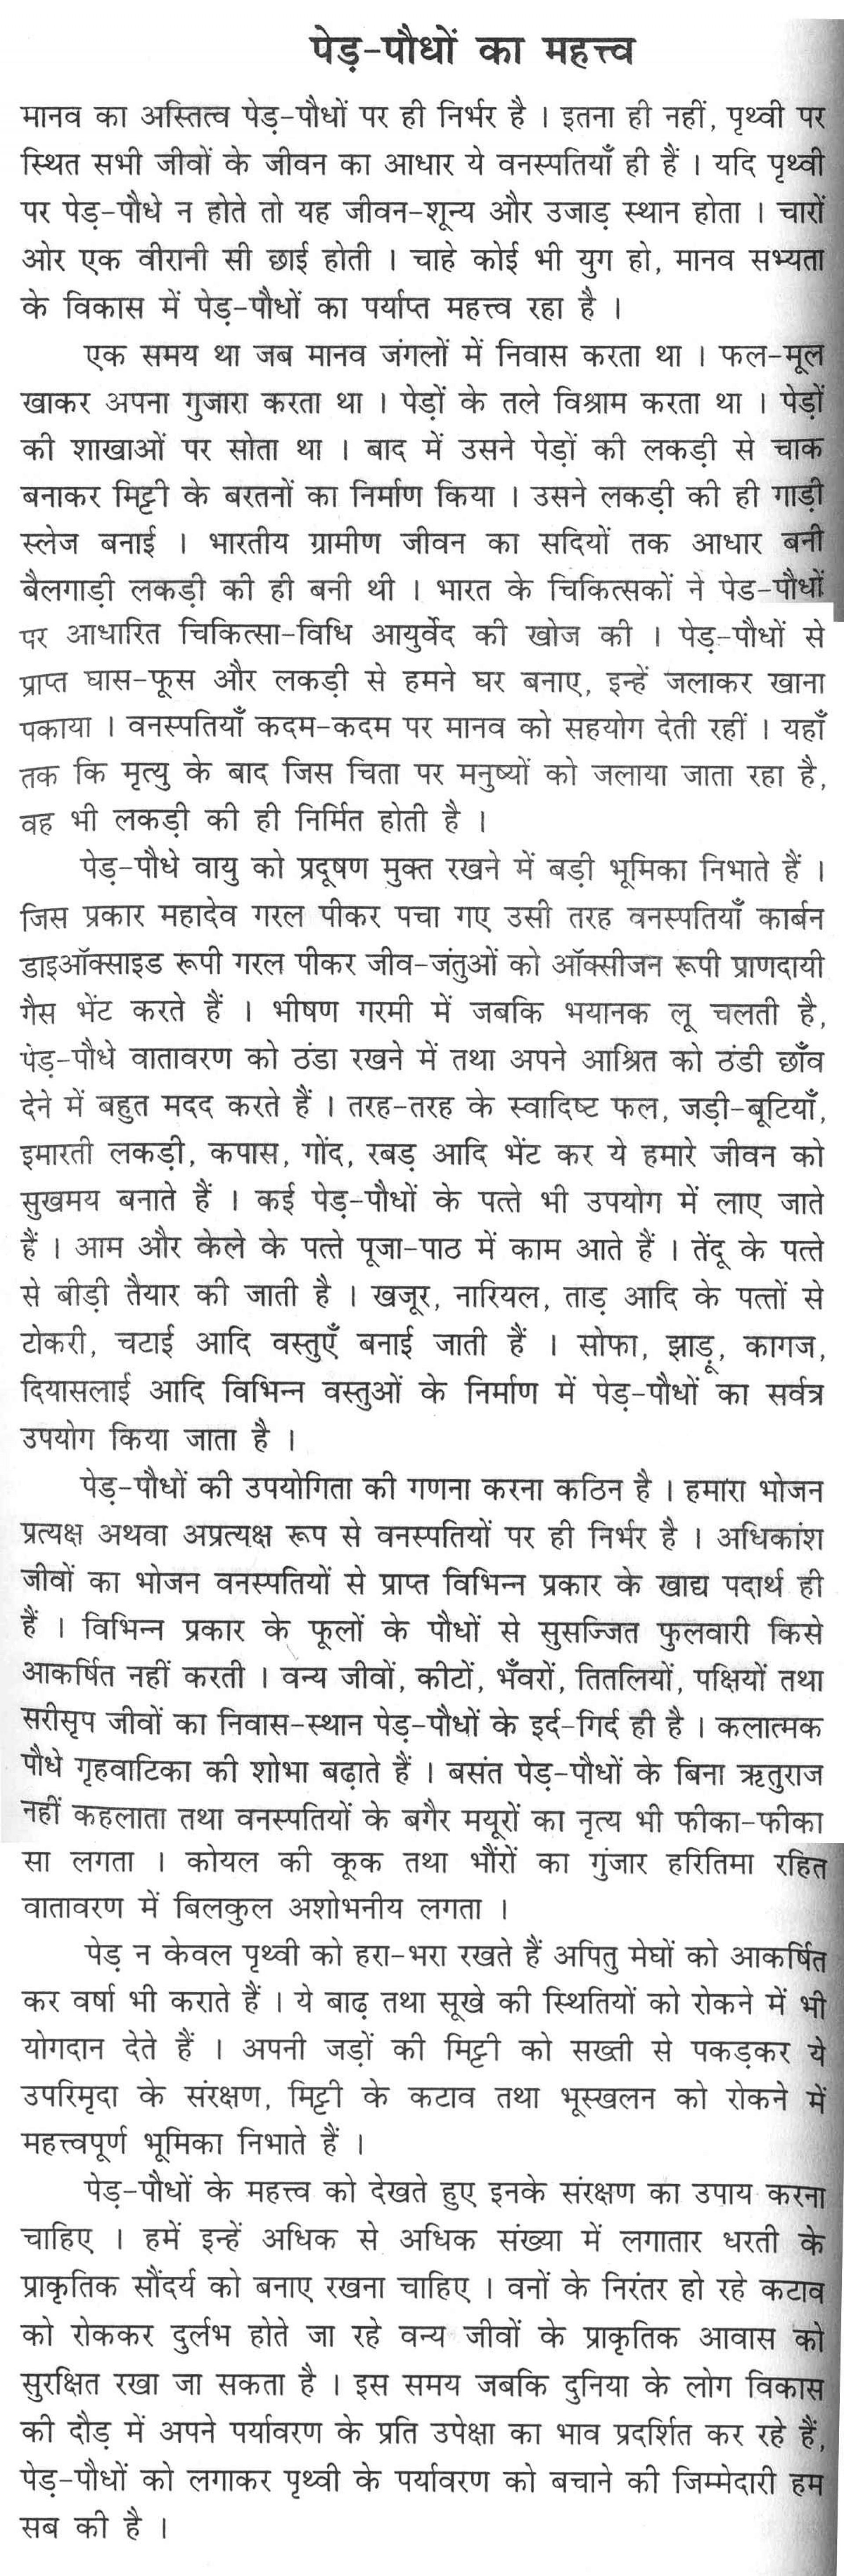 001 Voting Important Essay Thumb Importance Of In Punjabi Essays Kannada On The Rights India Pdf Tamil English Hindi Persuasive Unforgettable Marathi 1920